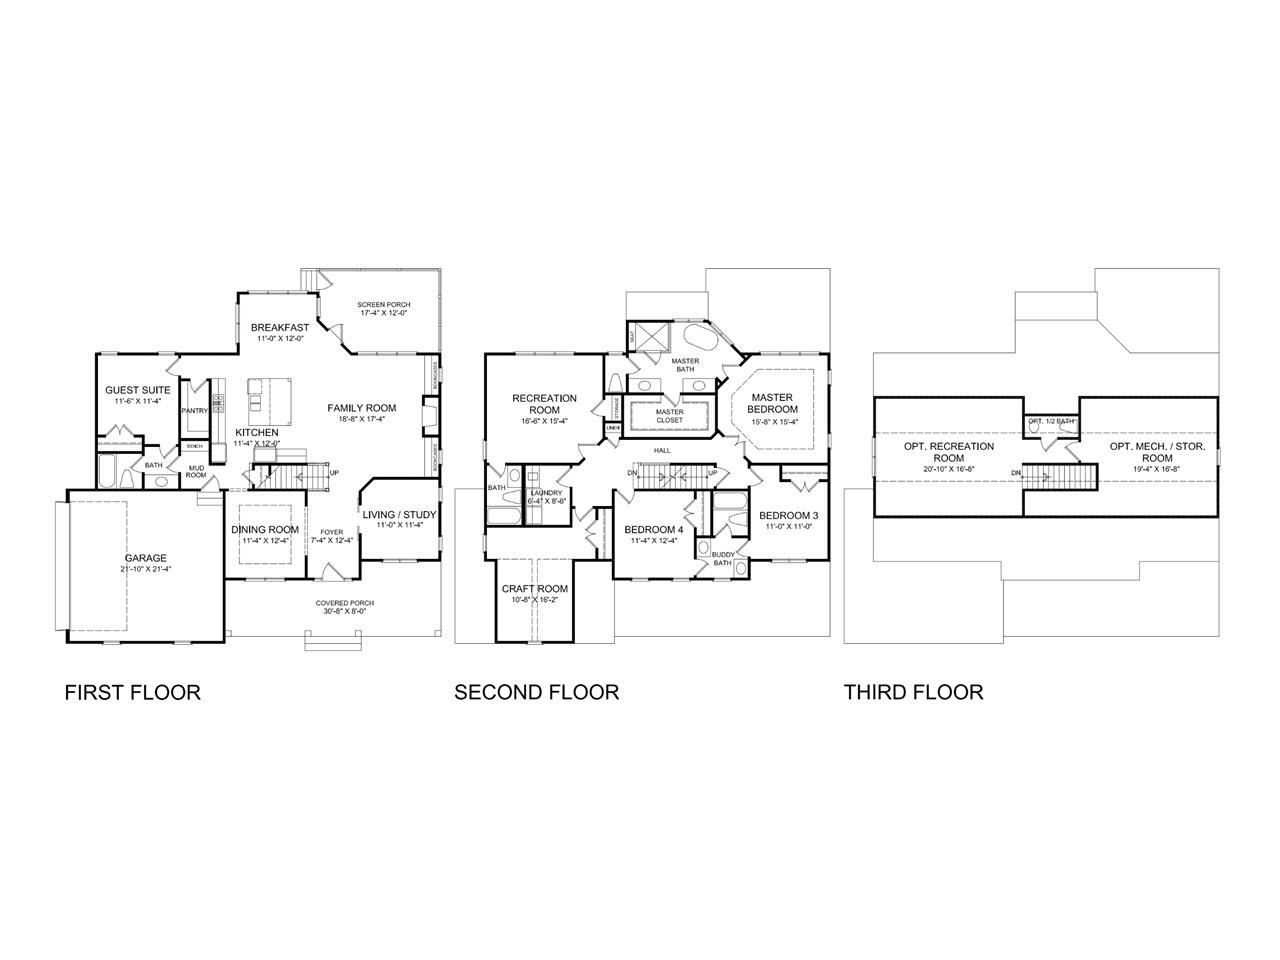 Lot 36 floorplan the ally.jpg